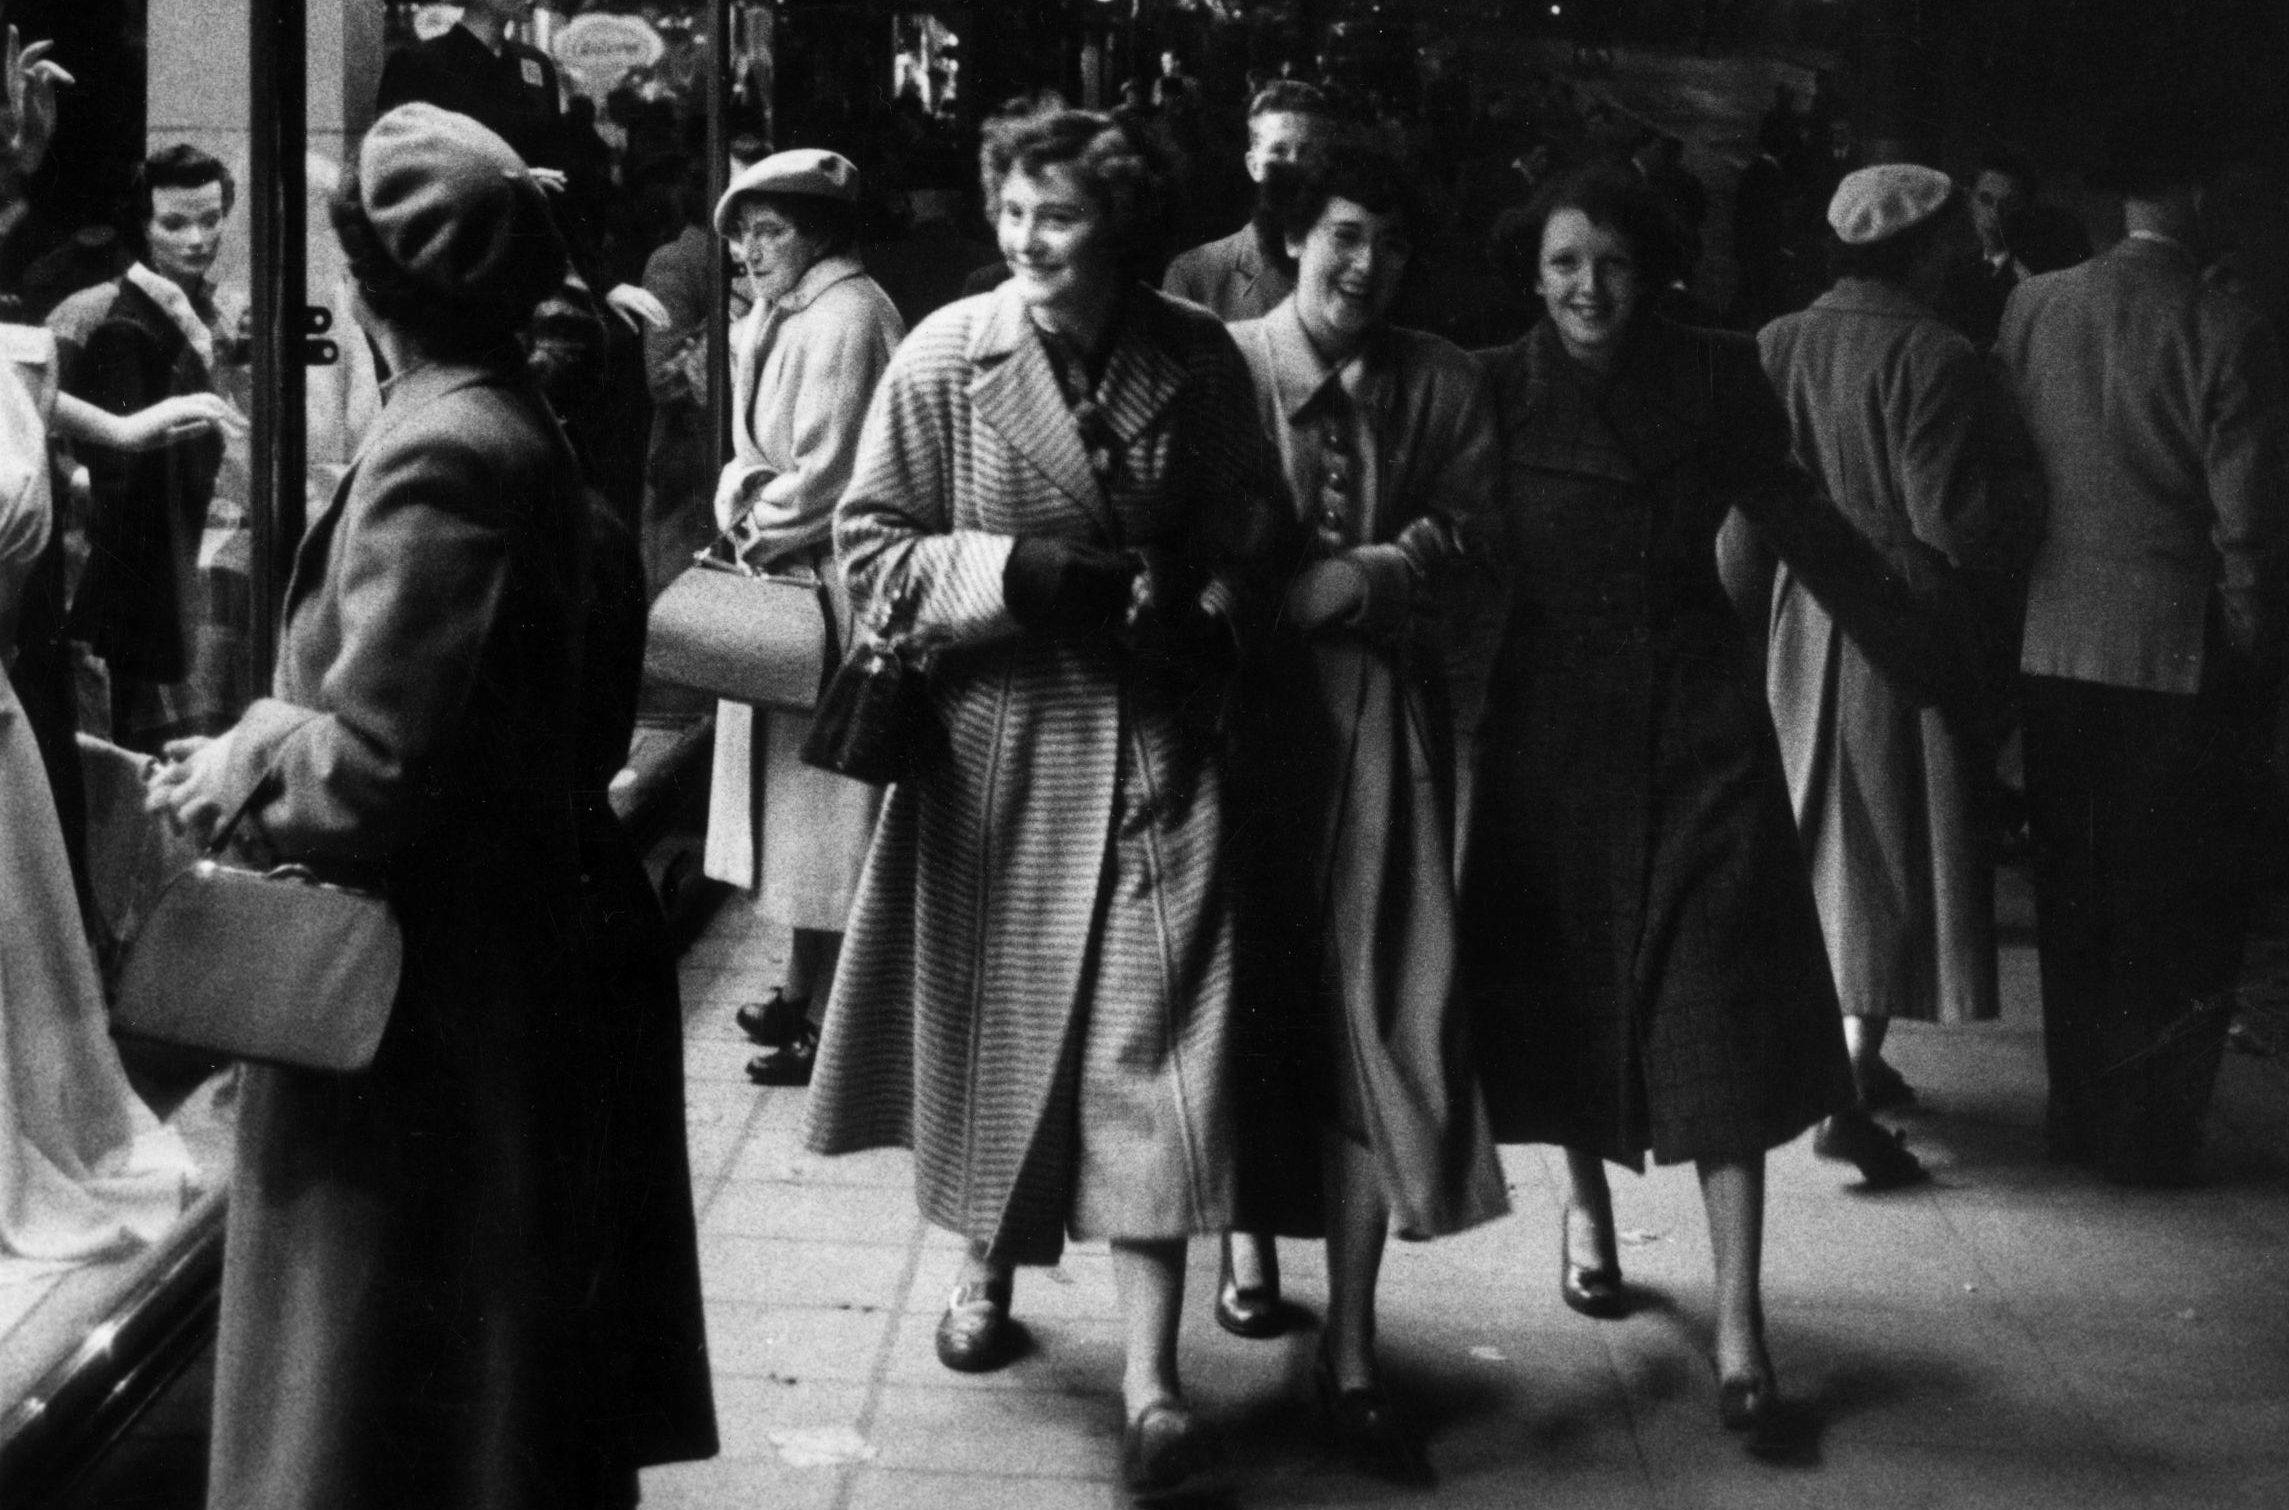 Sauchiehall Street in 1950s heyday (Getty Images)